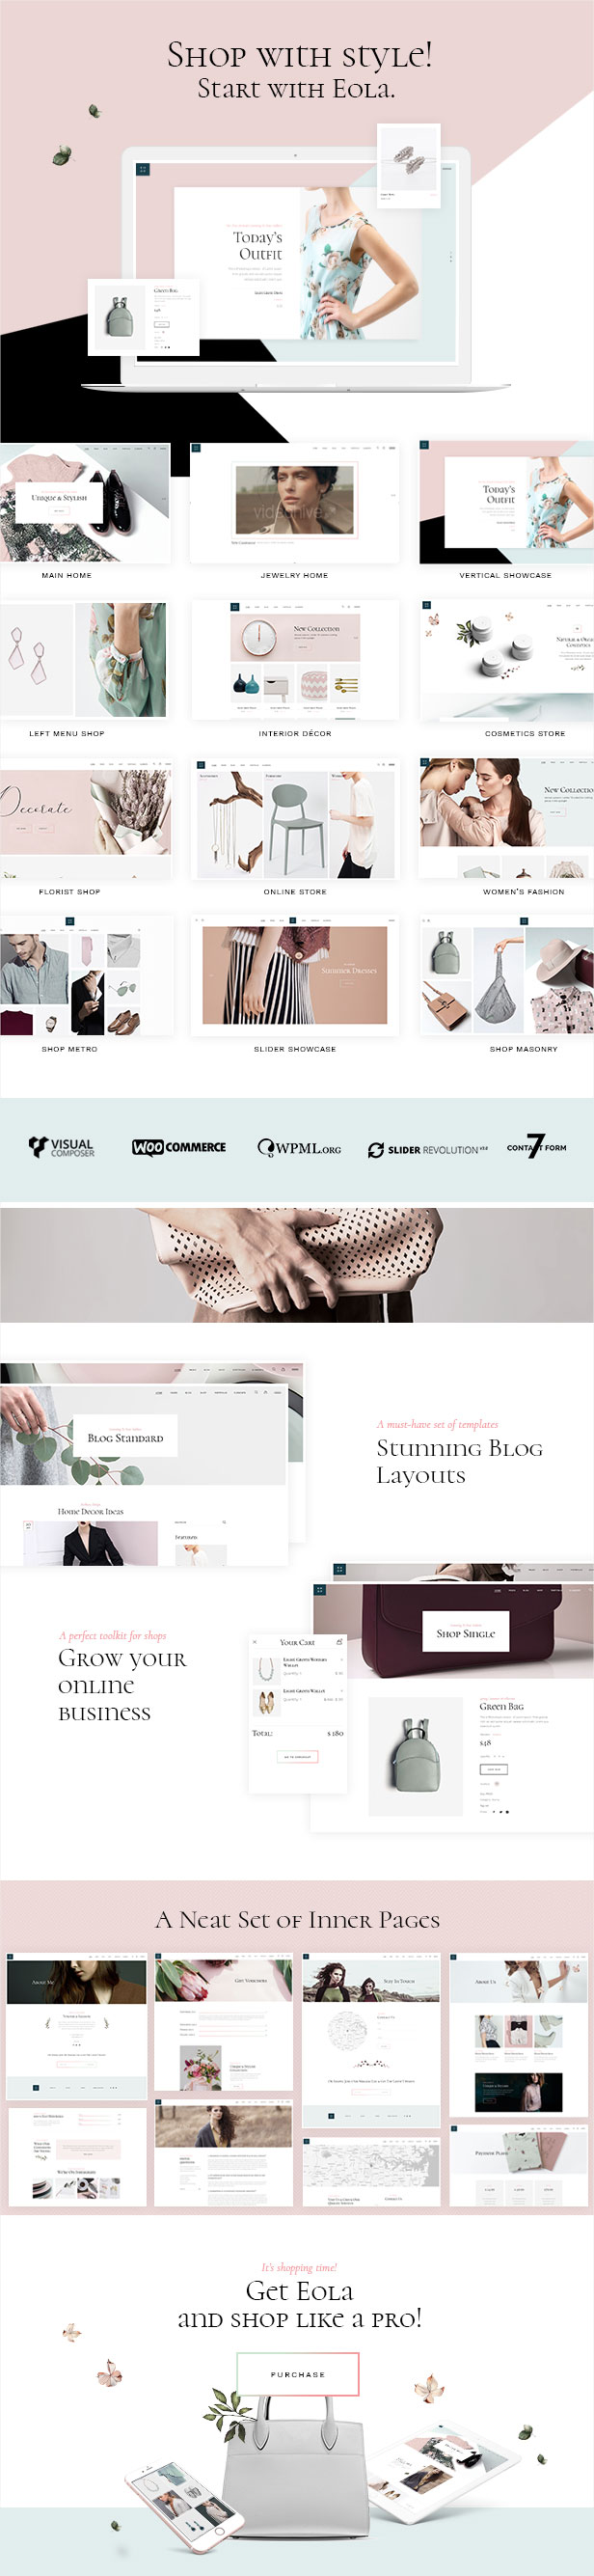 Eola - Ein elegantes, vielseitiges WooCommerce-Template